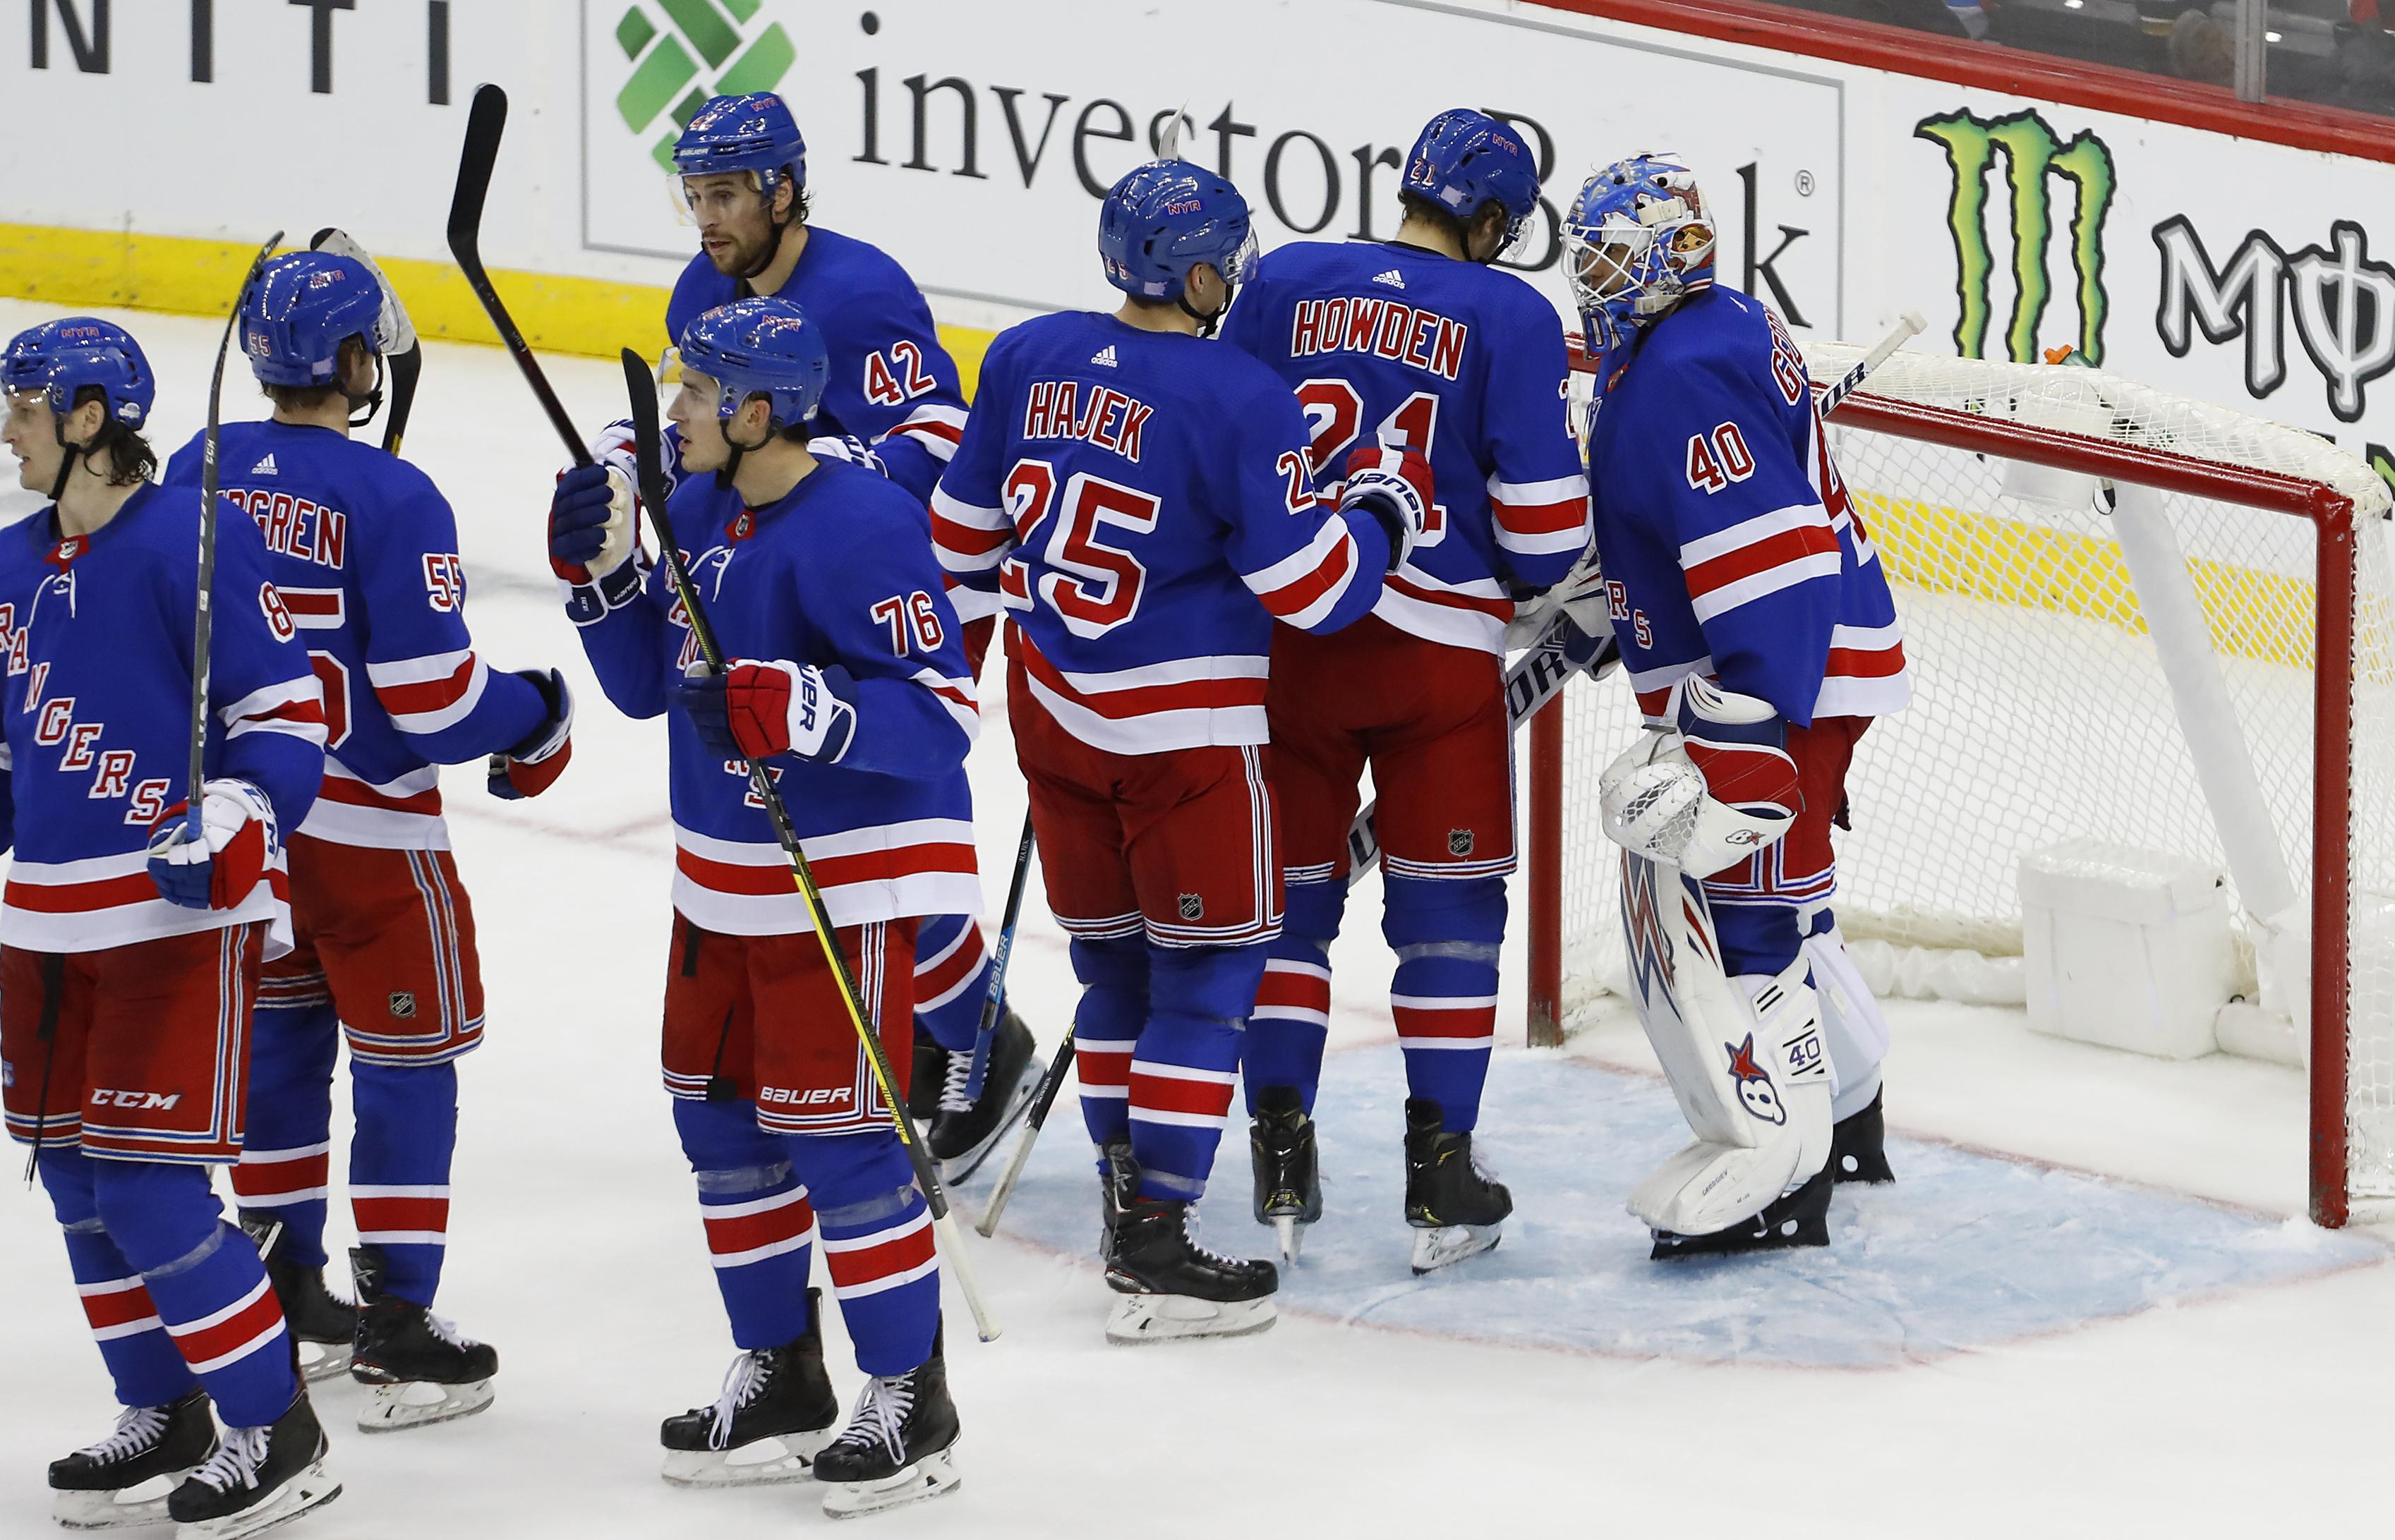 Georgiev makes 33 saves, Rangers shut out Devils 4-0